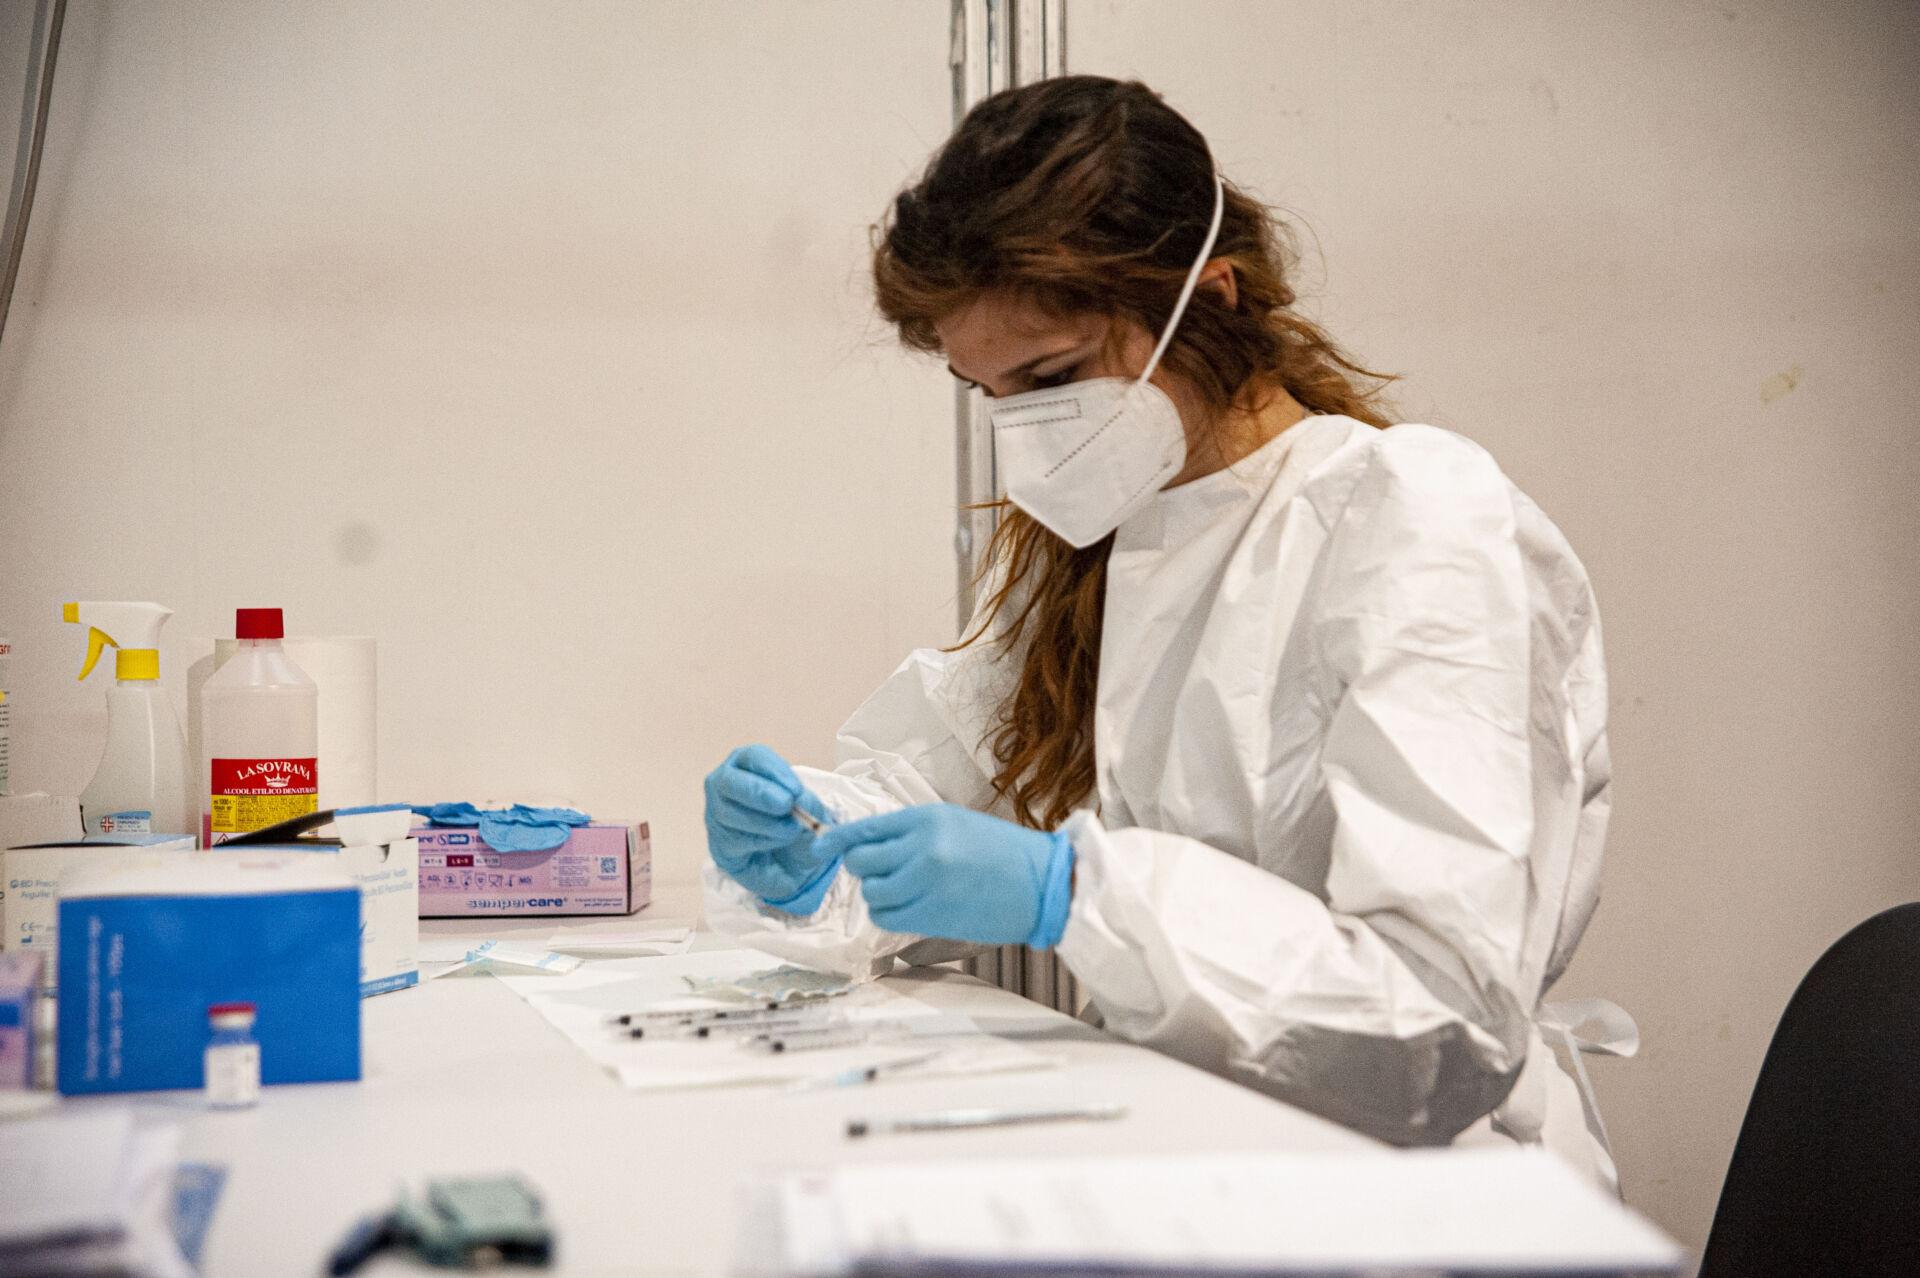 Campagna vaccinale Unimol ph.Mariano Faenza